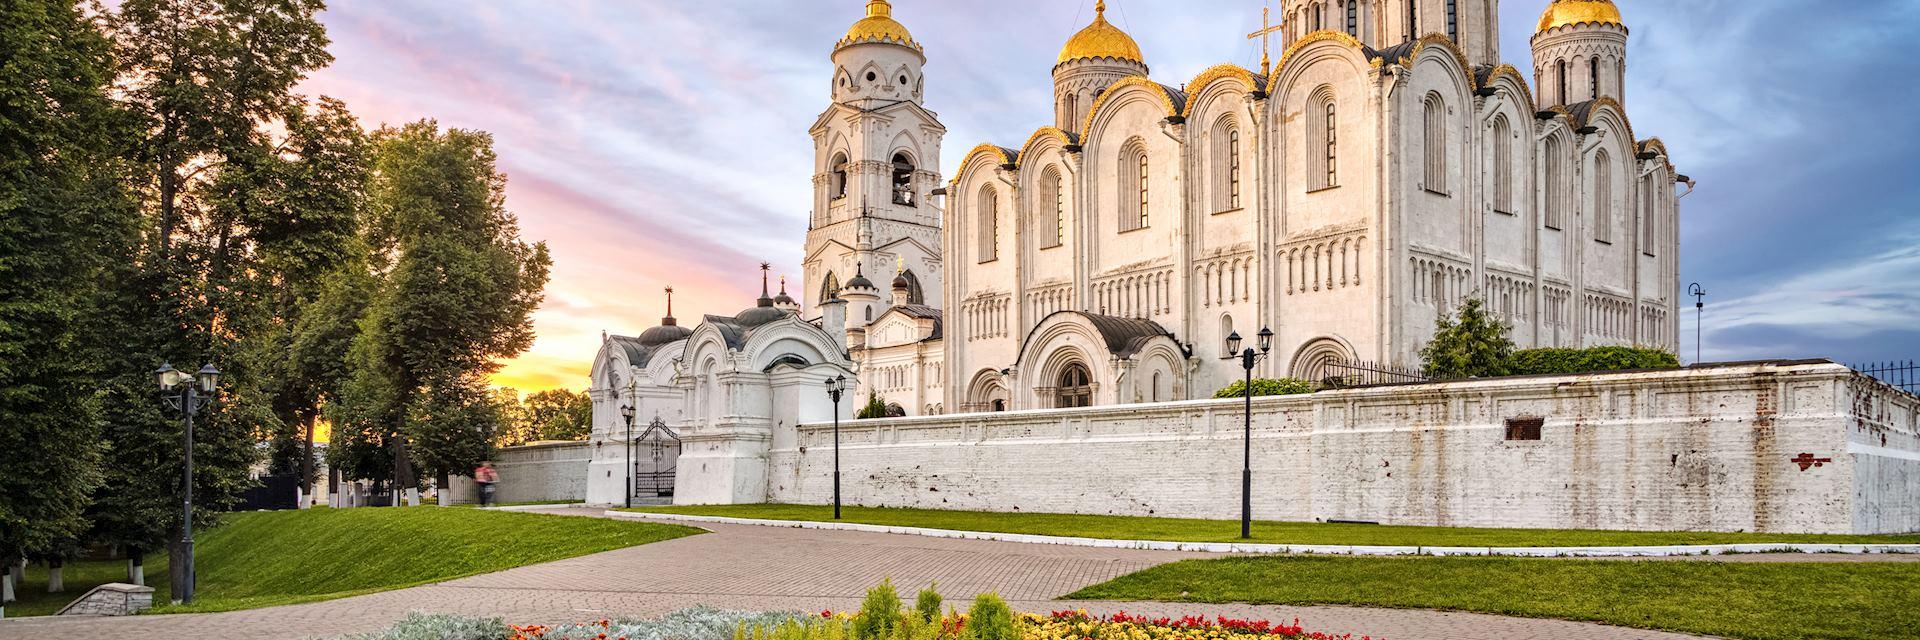 Uspenskiy cathedral, Vladimir